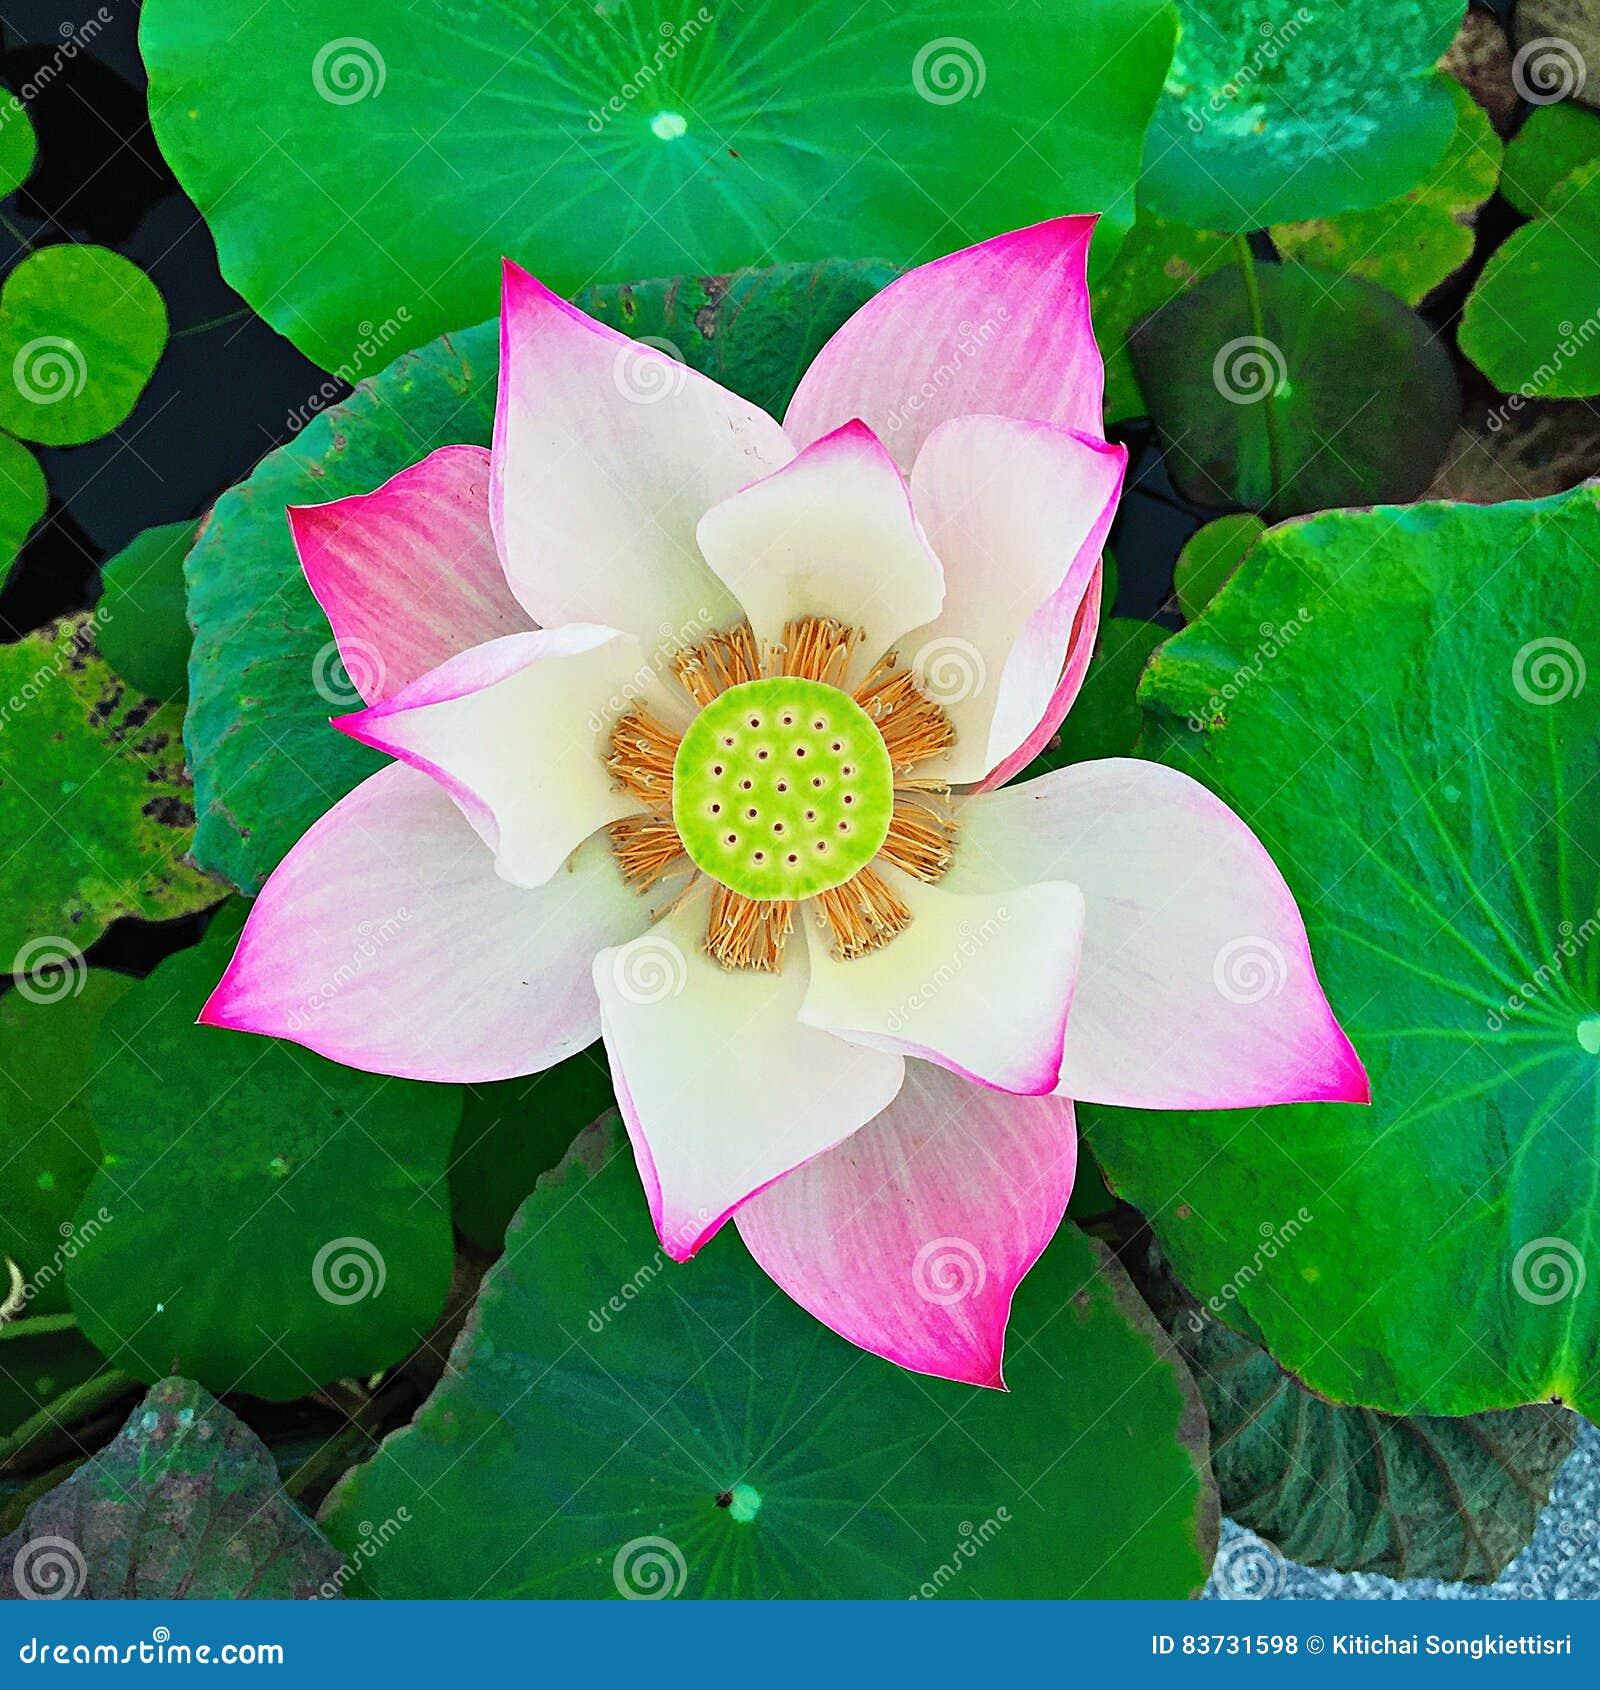 Lotus flower beautiful thai stock photo image of pure leaf 83731598 download lotus flower beautiful thai stock photo image of pure leaf 83731598 izmirmasajfo